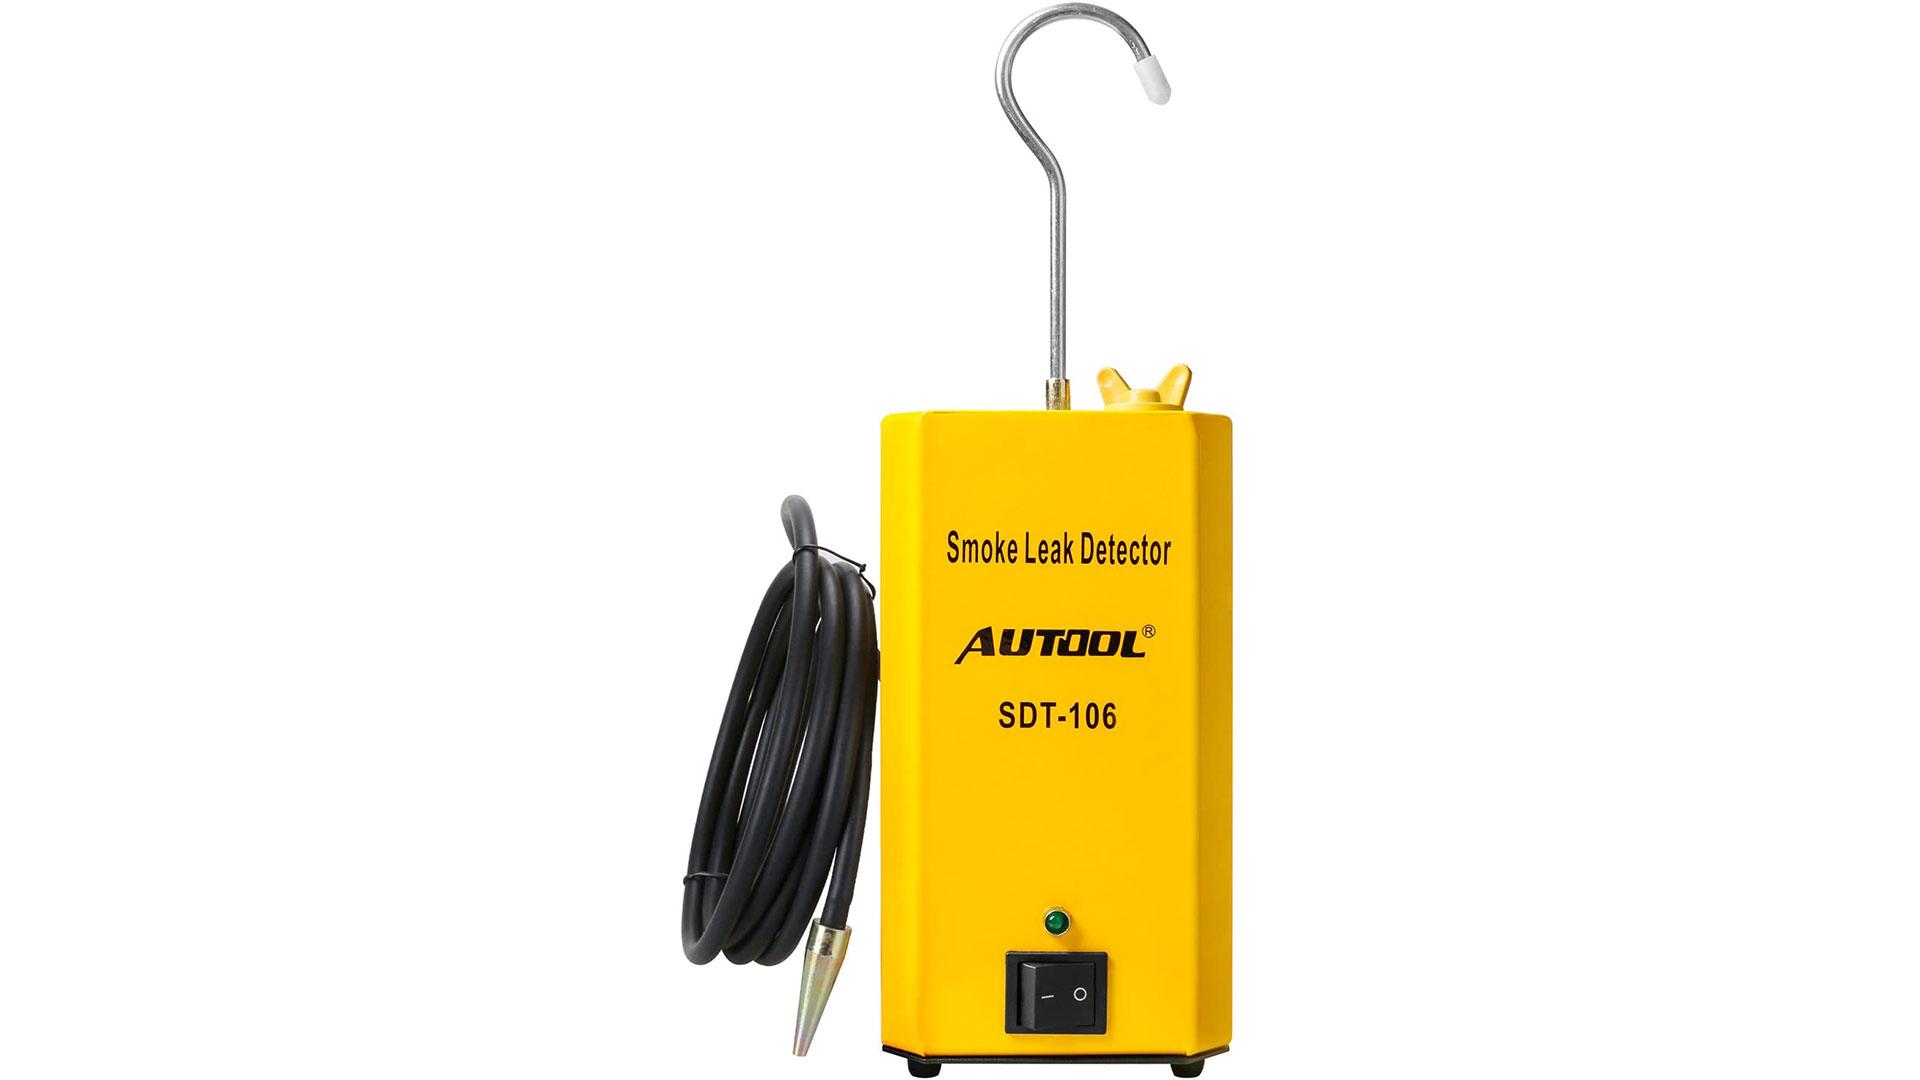 autool sdt 106 smoke leak detector